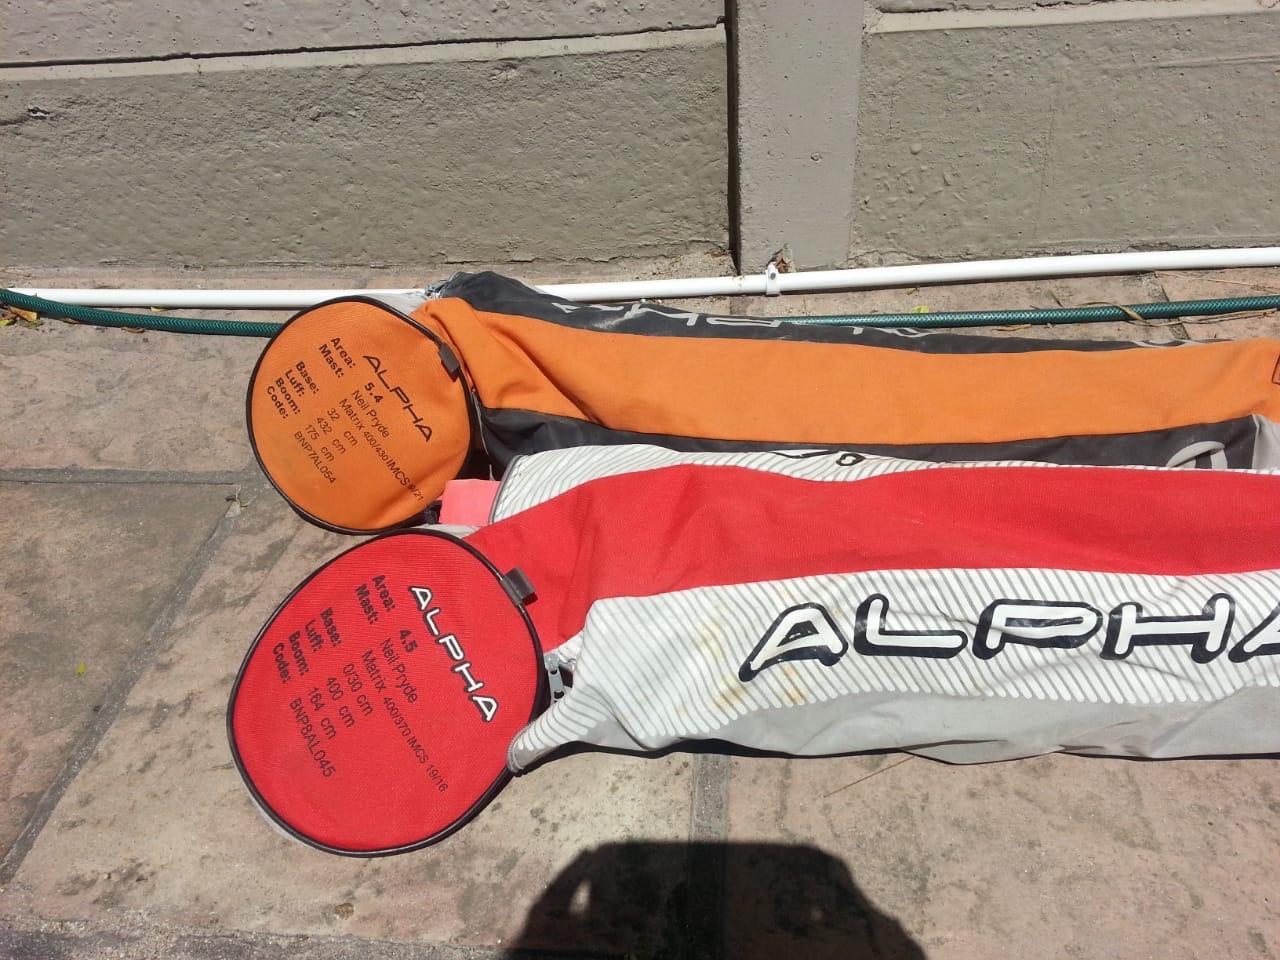 Pro windsurfing Equipment